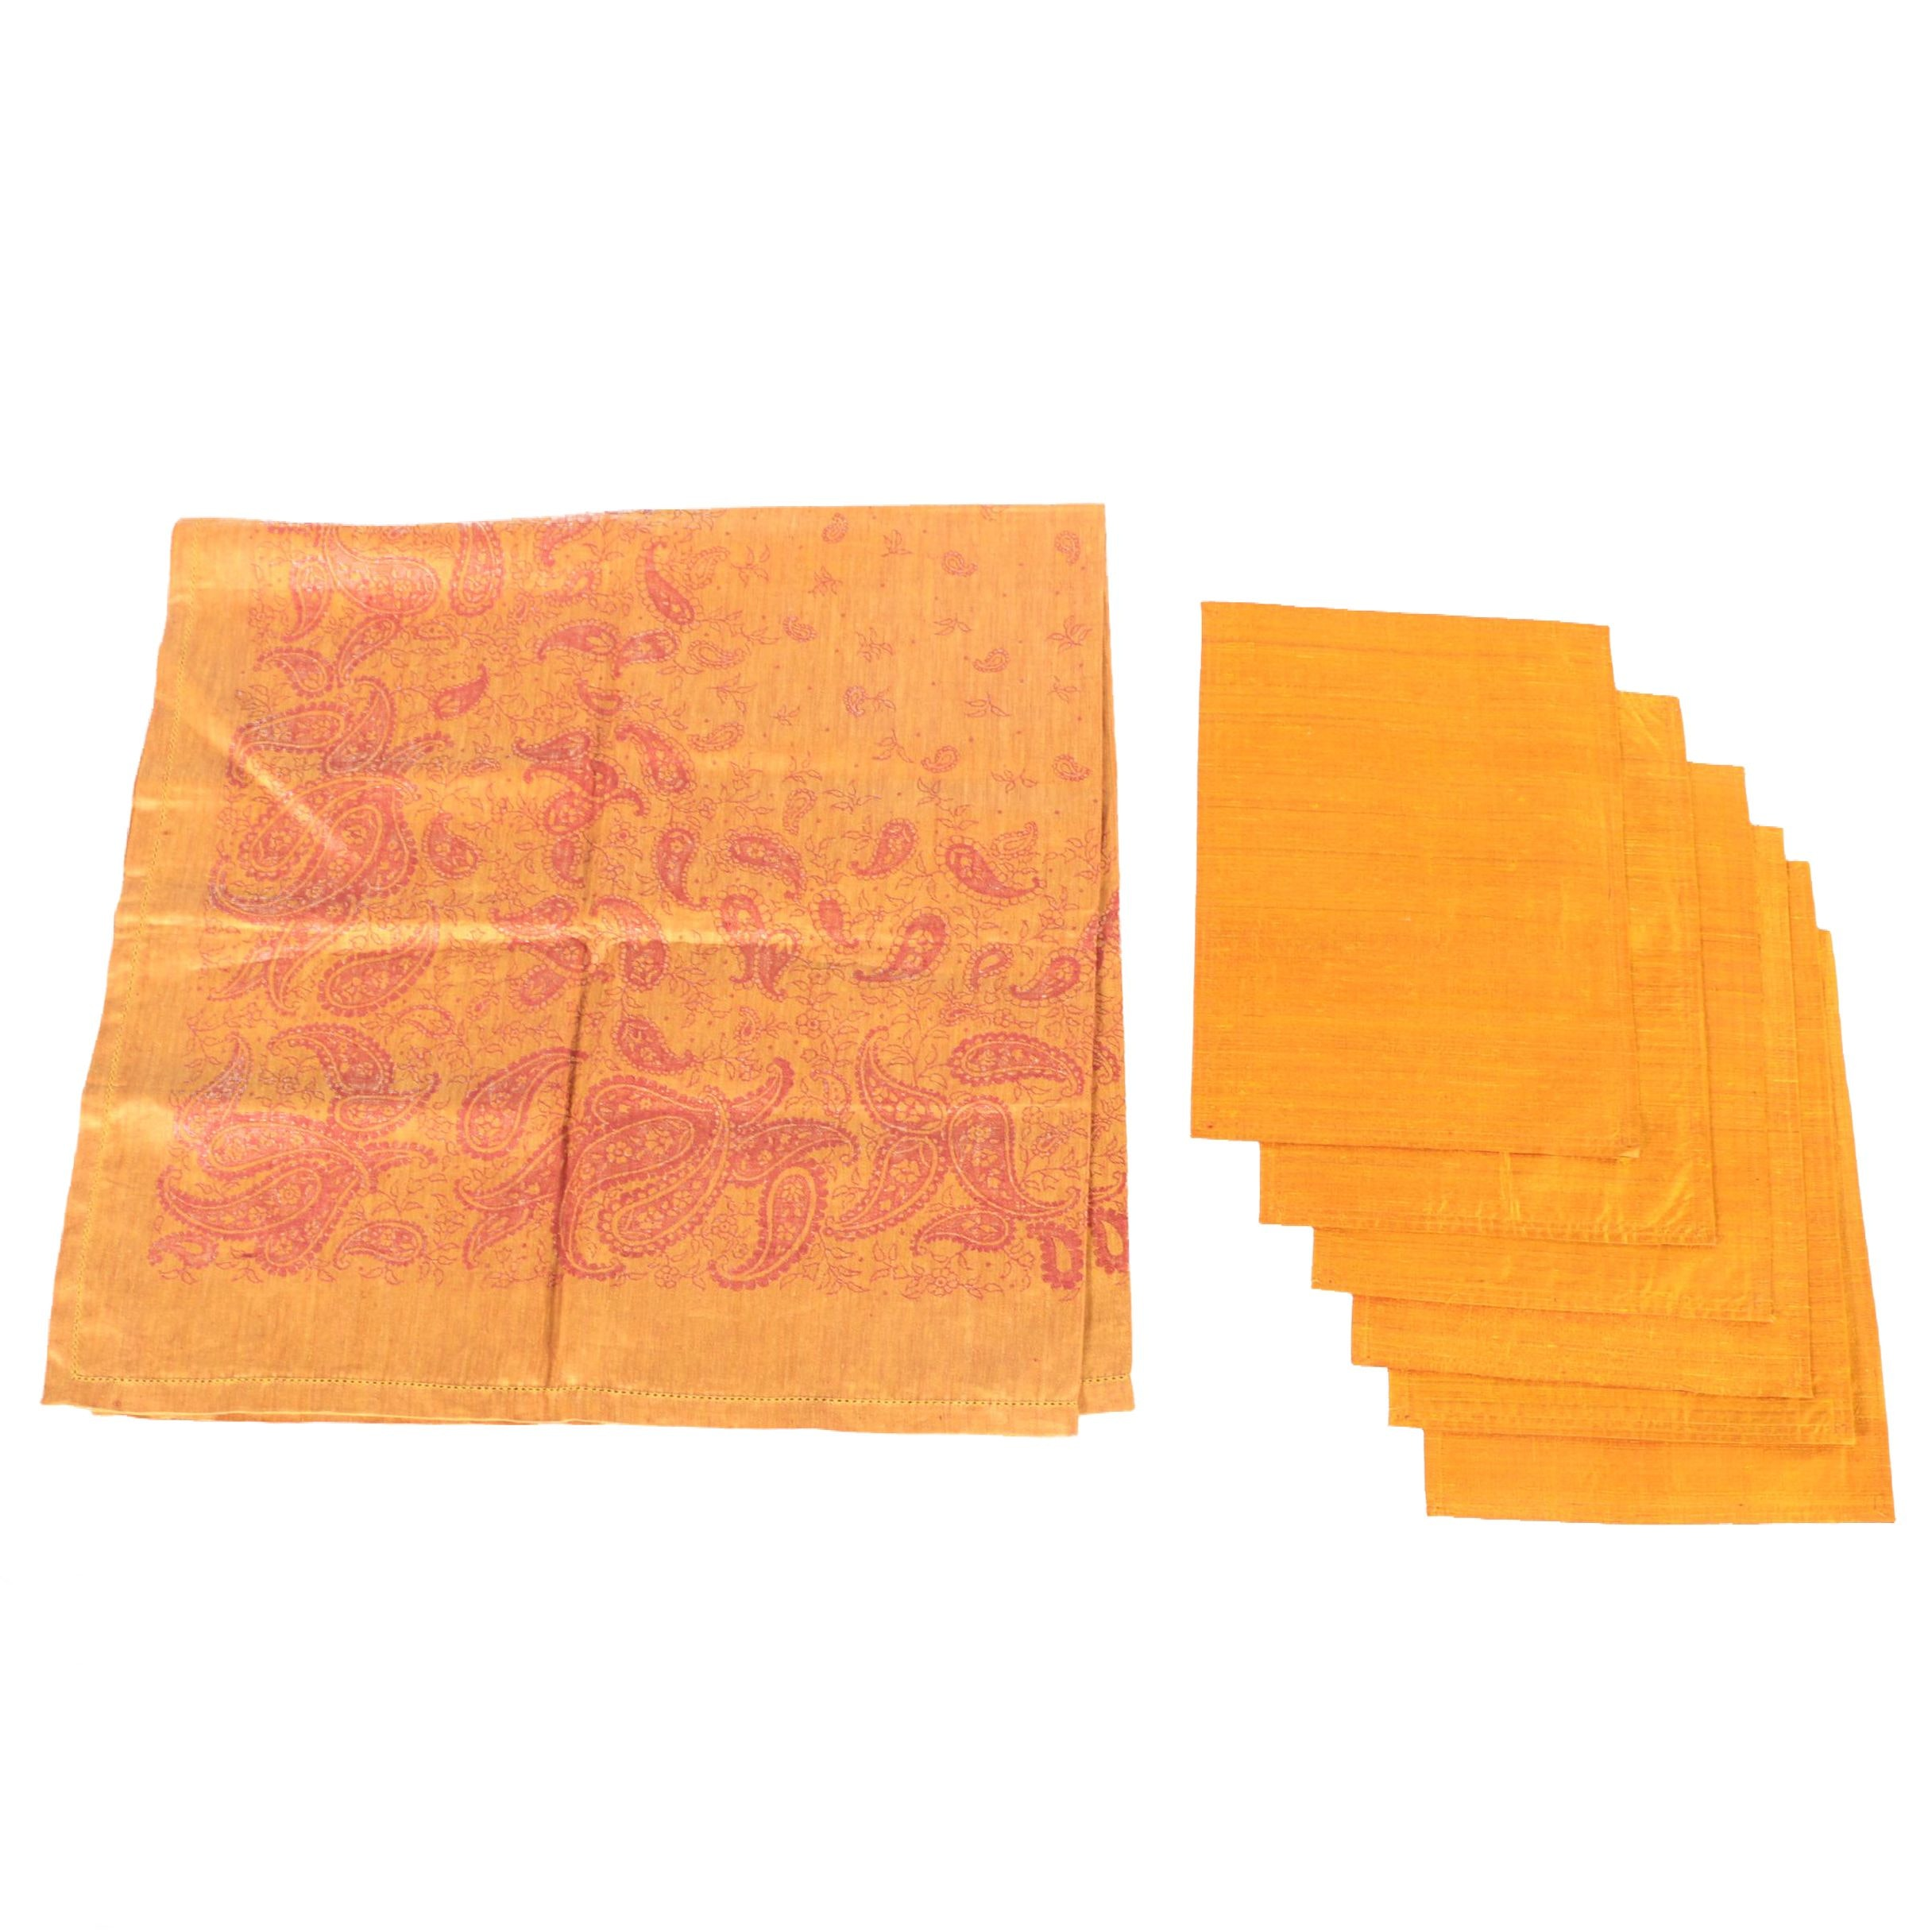 Paisley Tablecloth and Coordinating Napkins